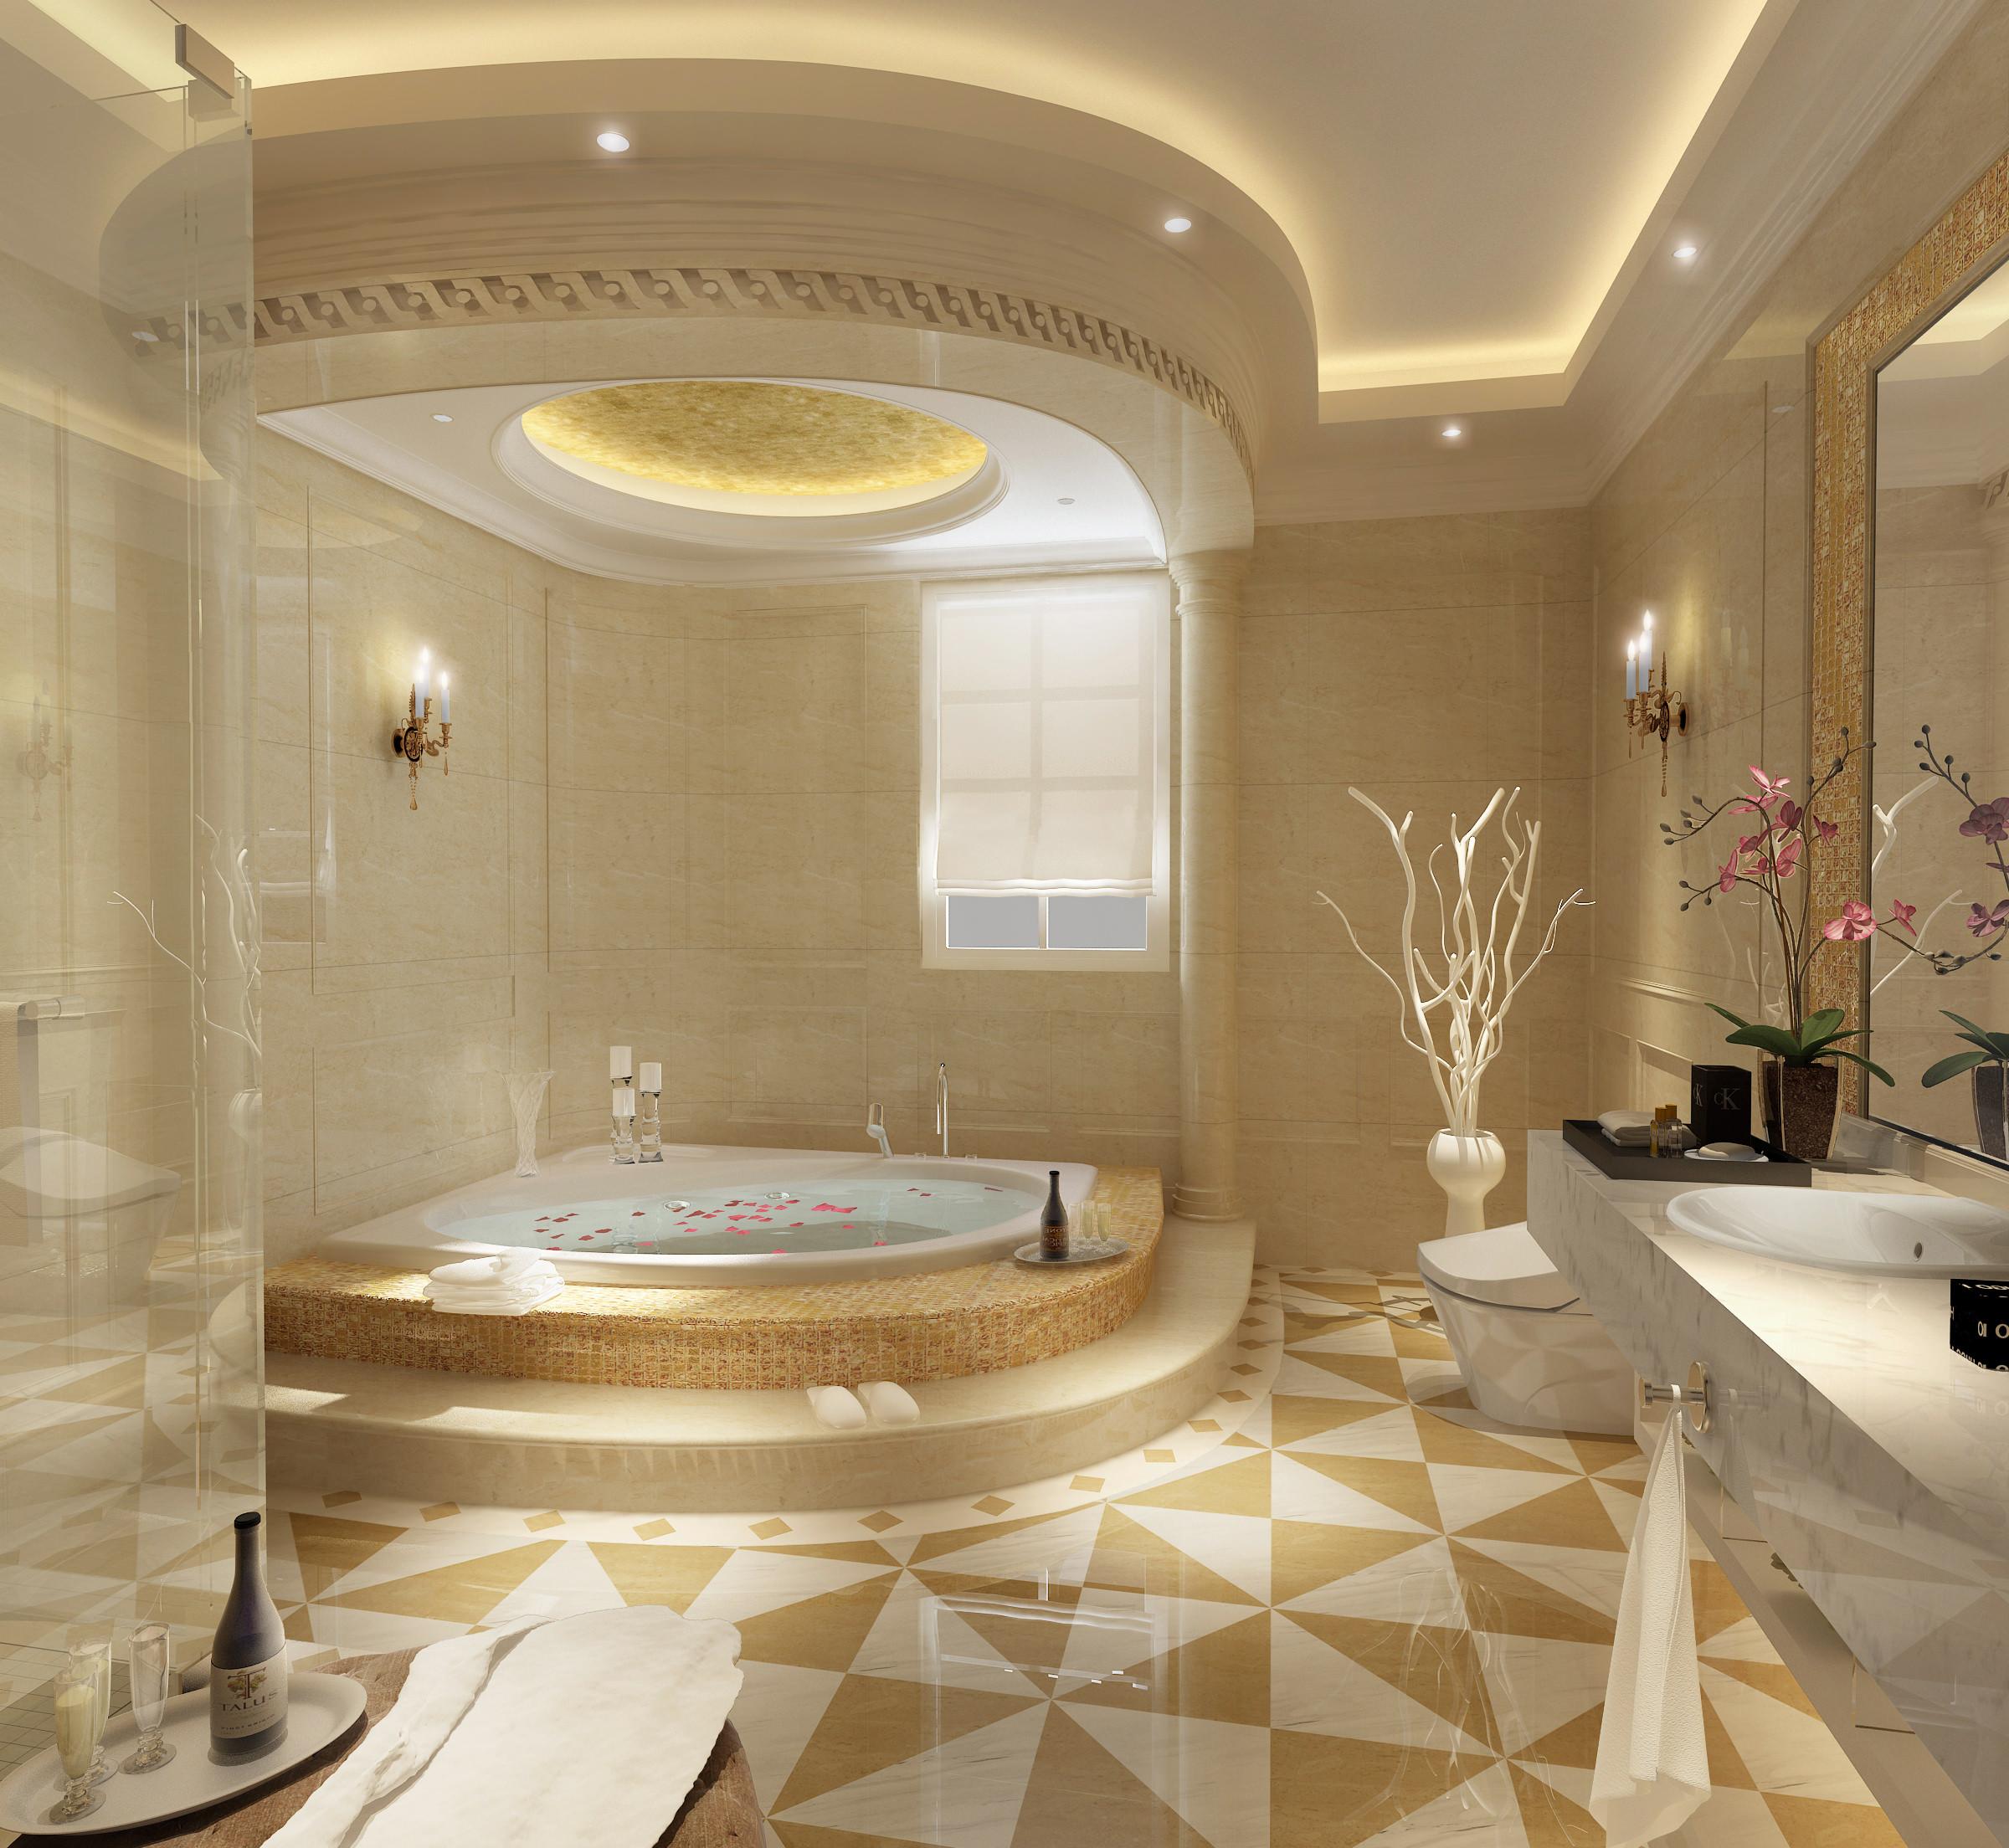 Luxury bathroom 3D Model MAX | CGTrader.com on Model Bathroom Ideas  id=26364